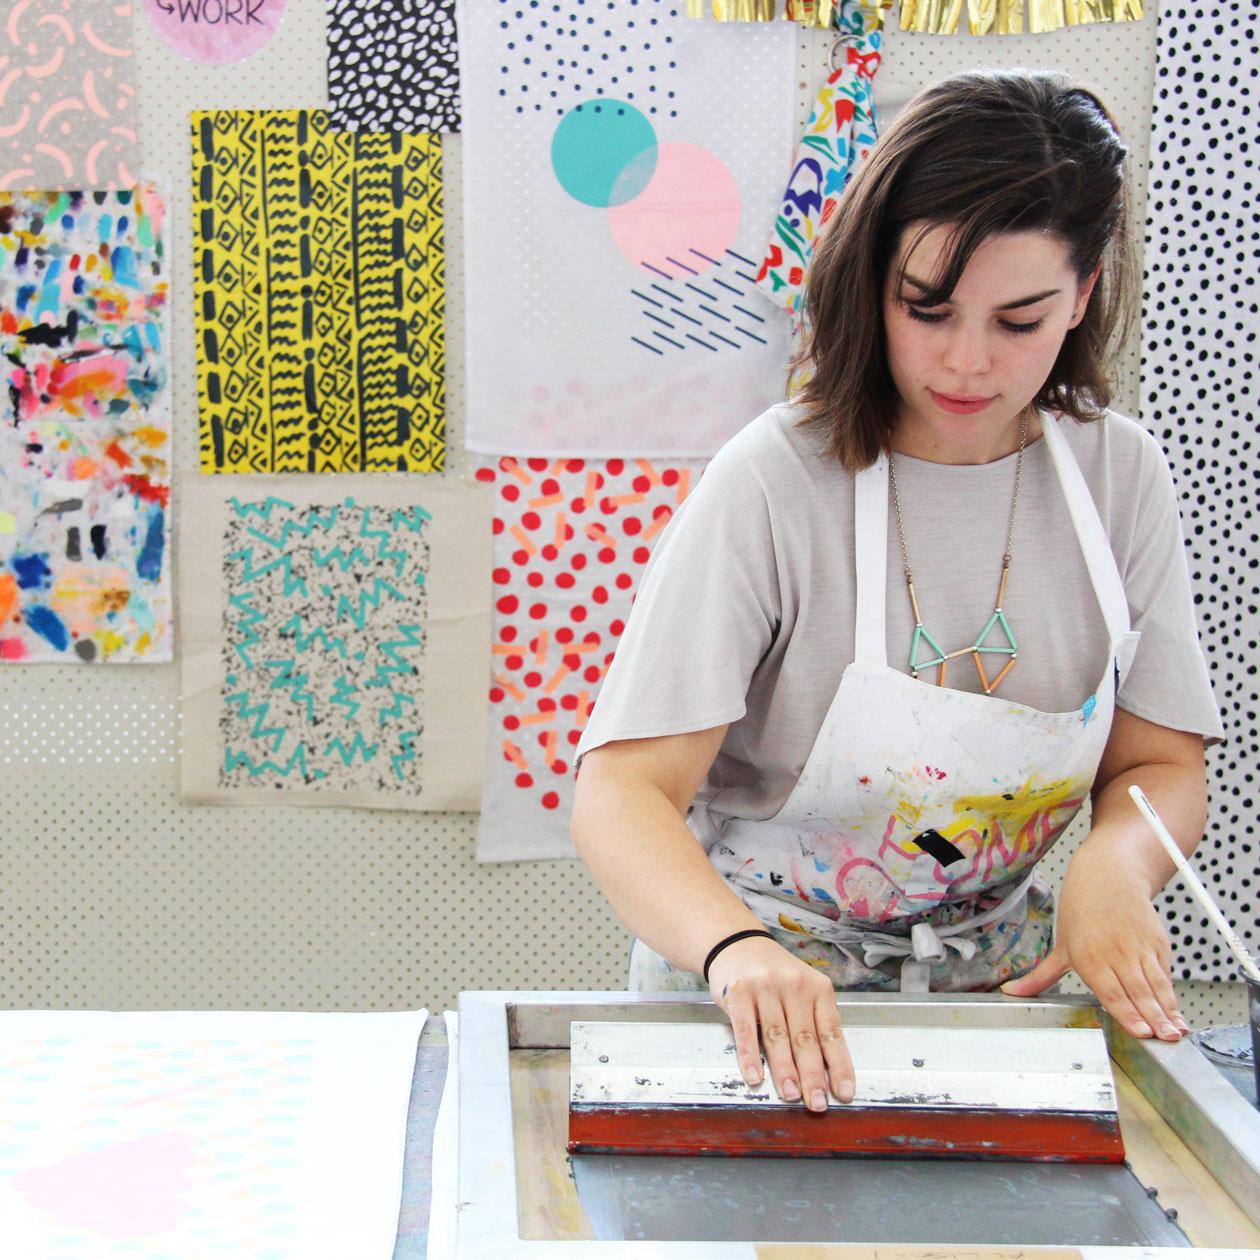 The-Windsor-Workshop-Home-Work-Screen-Printing-01.jpg